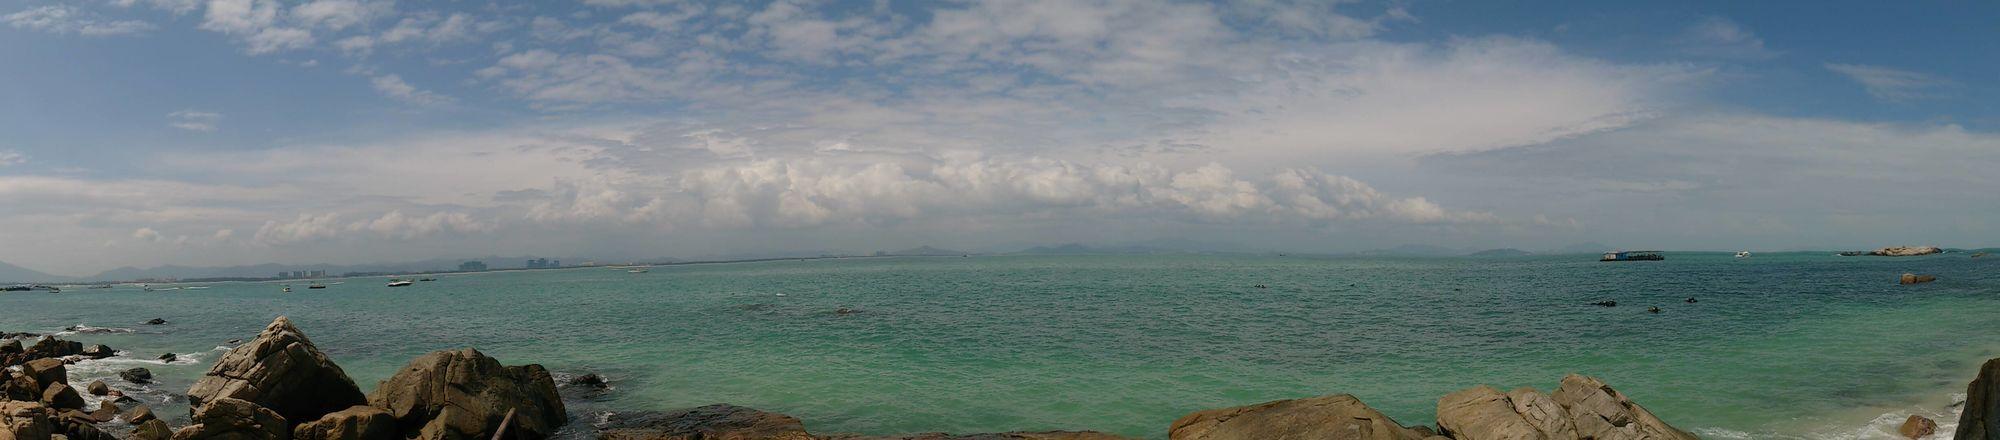 Panorama Hello World Seascape on Wuzhizhou island,Sanya,Hainan